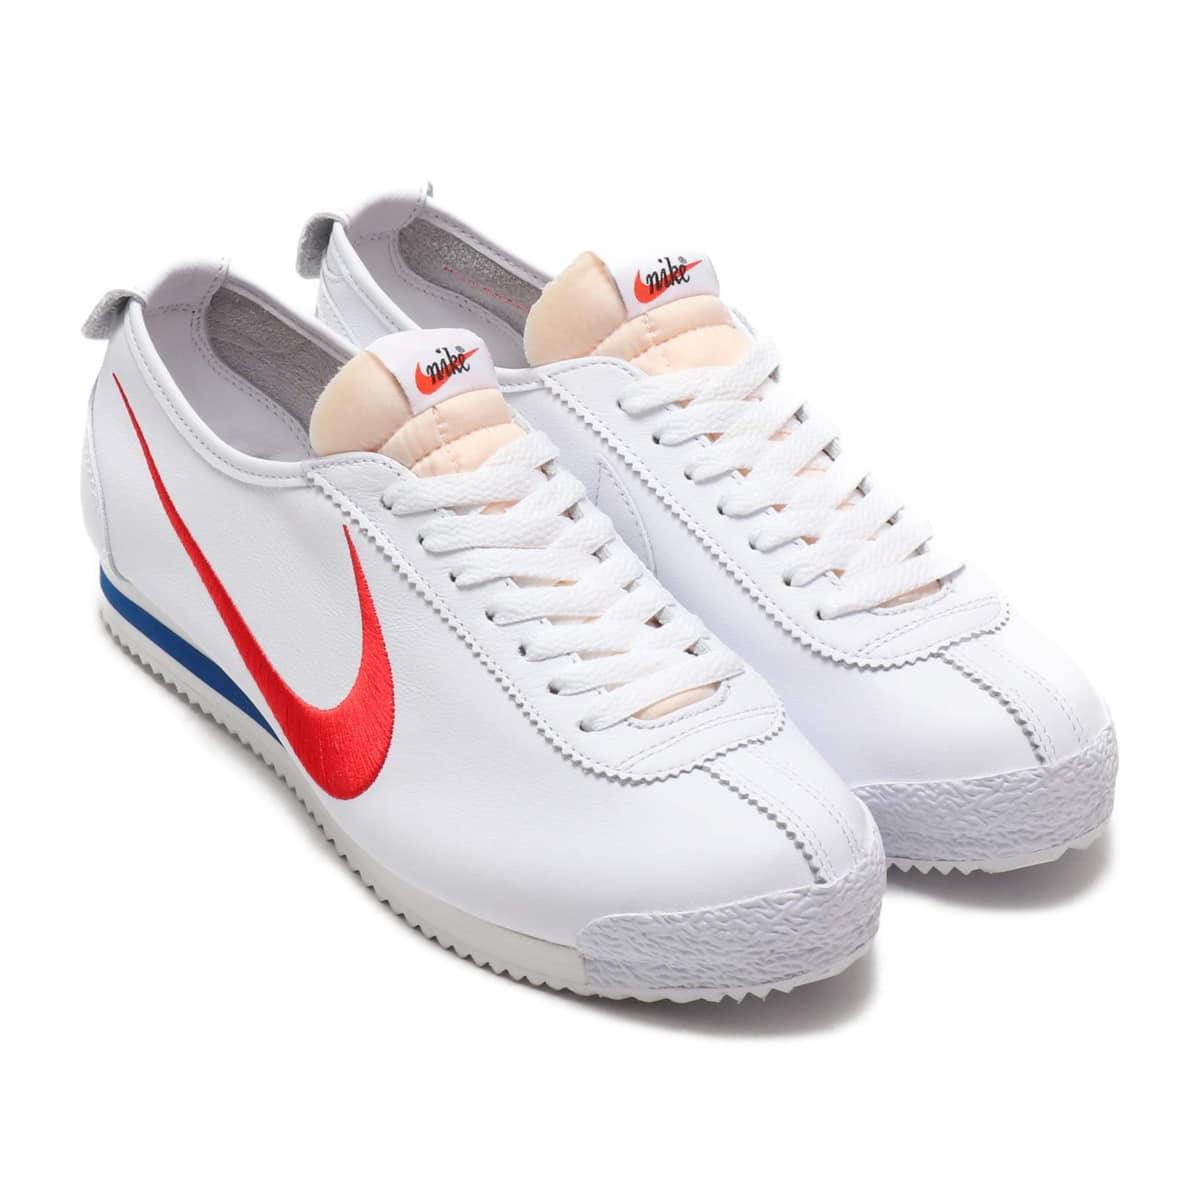 adidas classic cortez